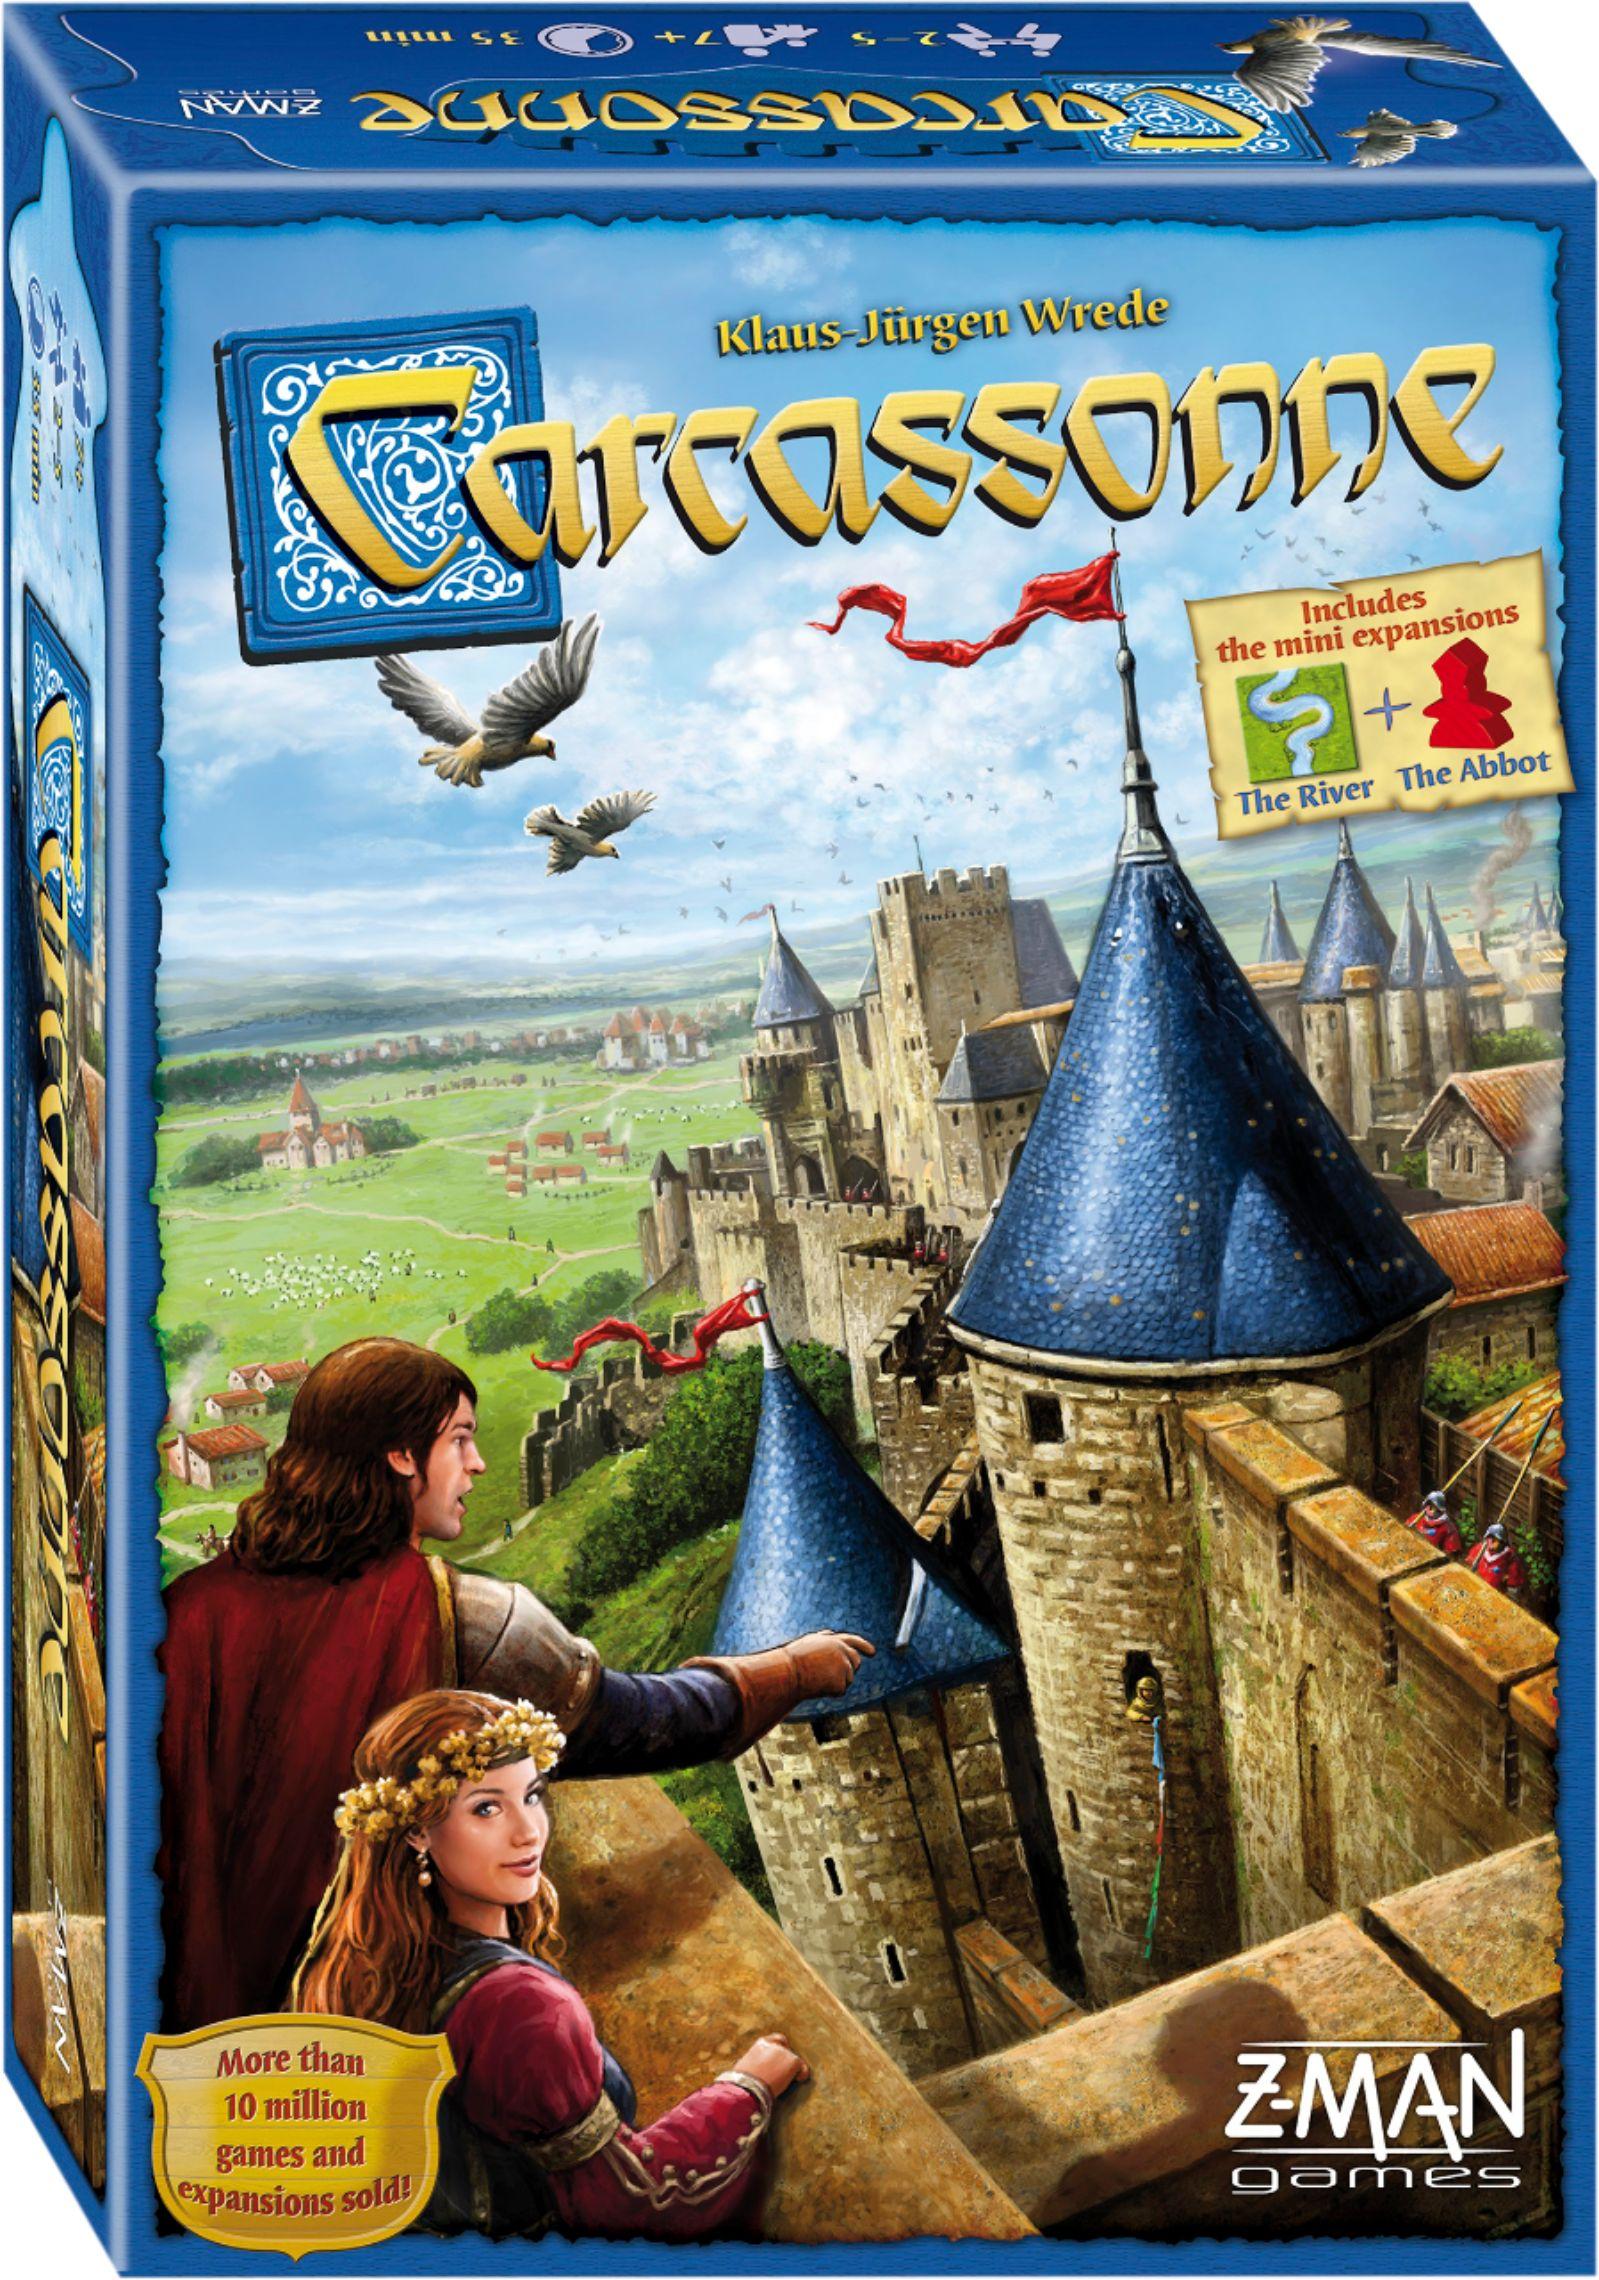 Z-man Games - Carcassonne Board Game